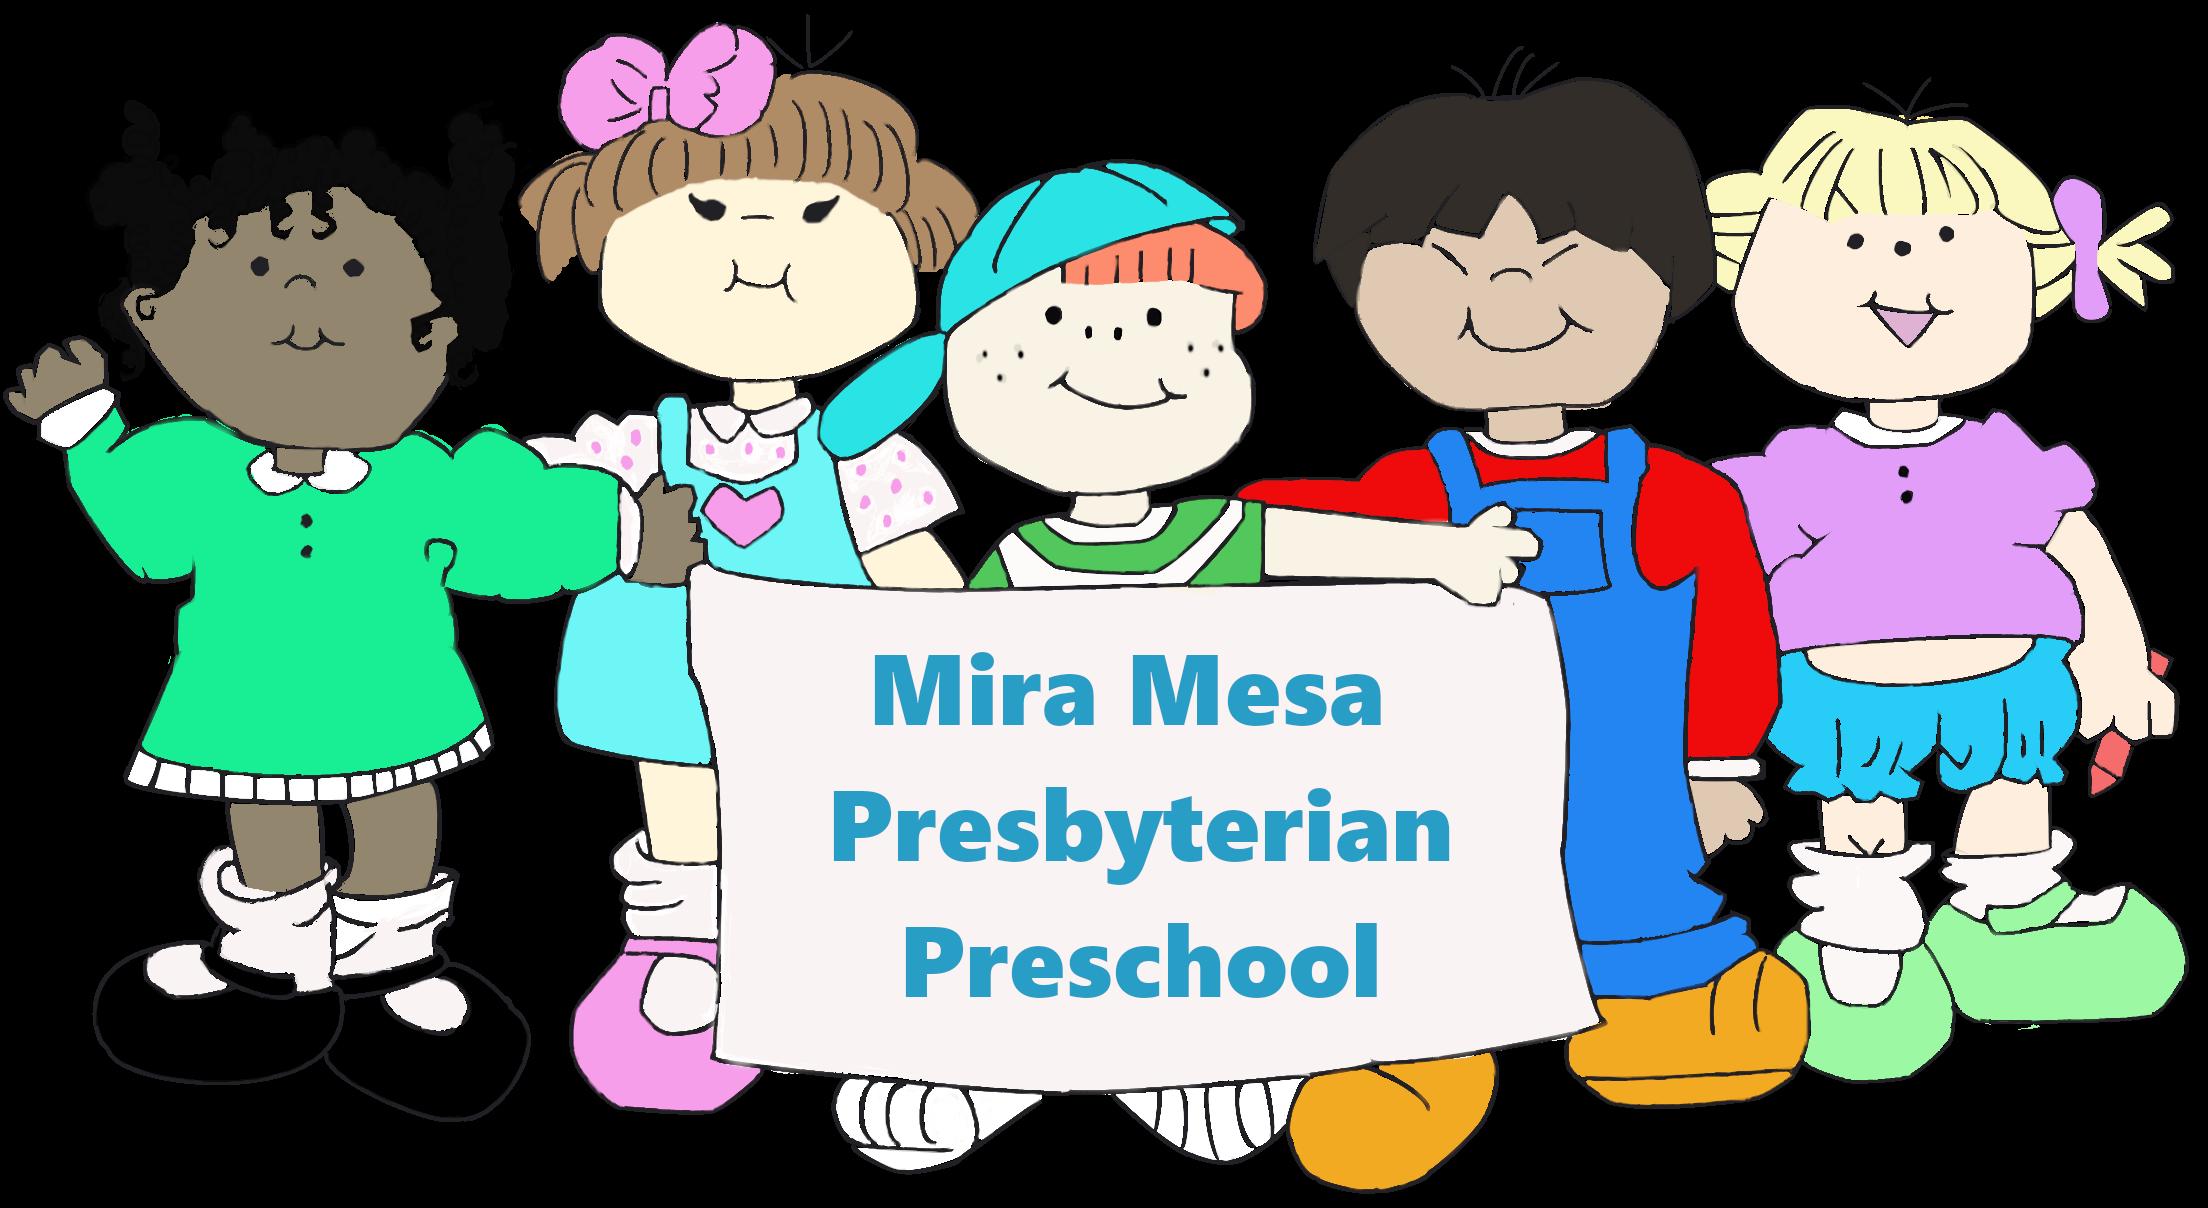 Mira Mesa Presbyterian Preschool